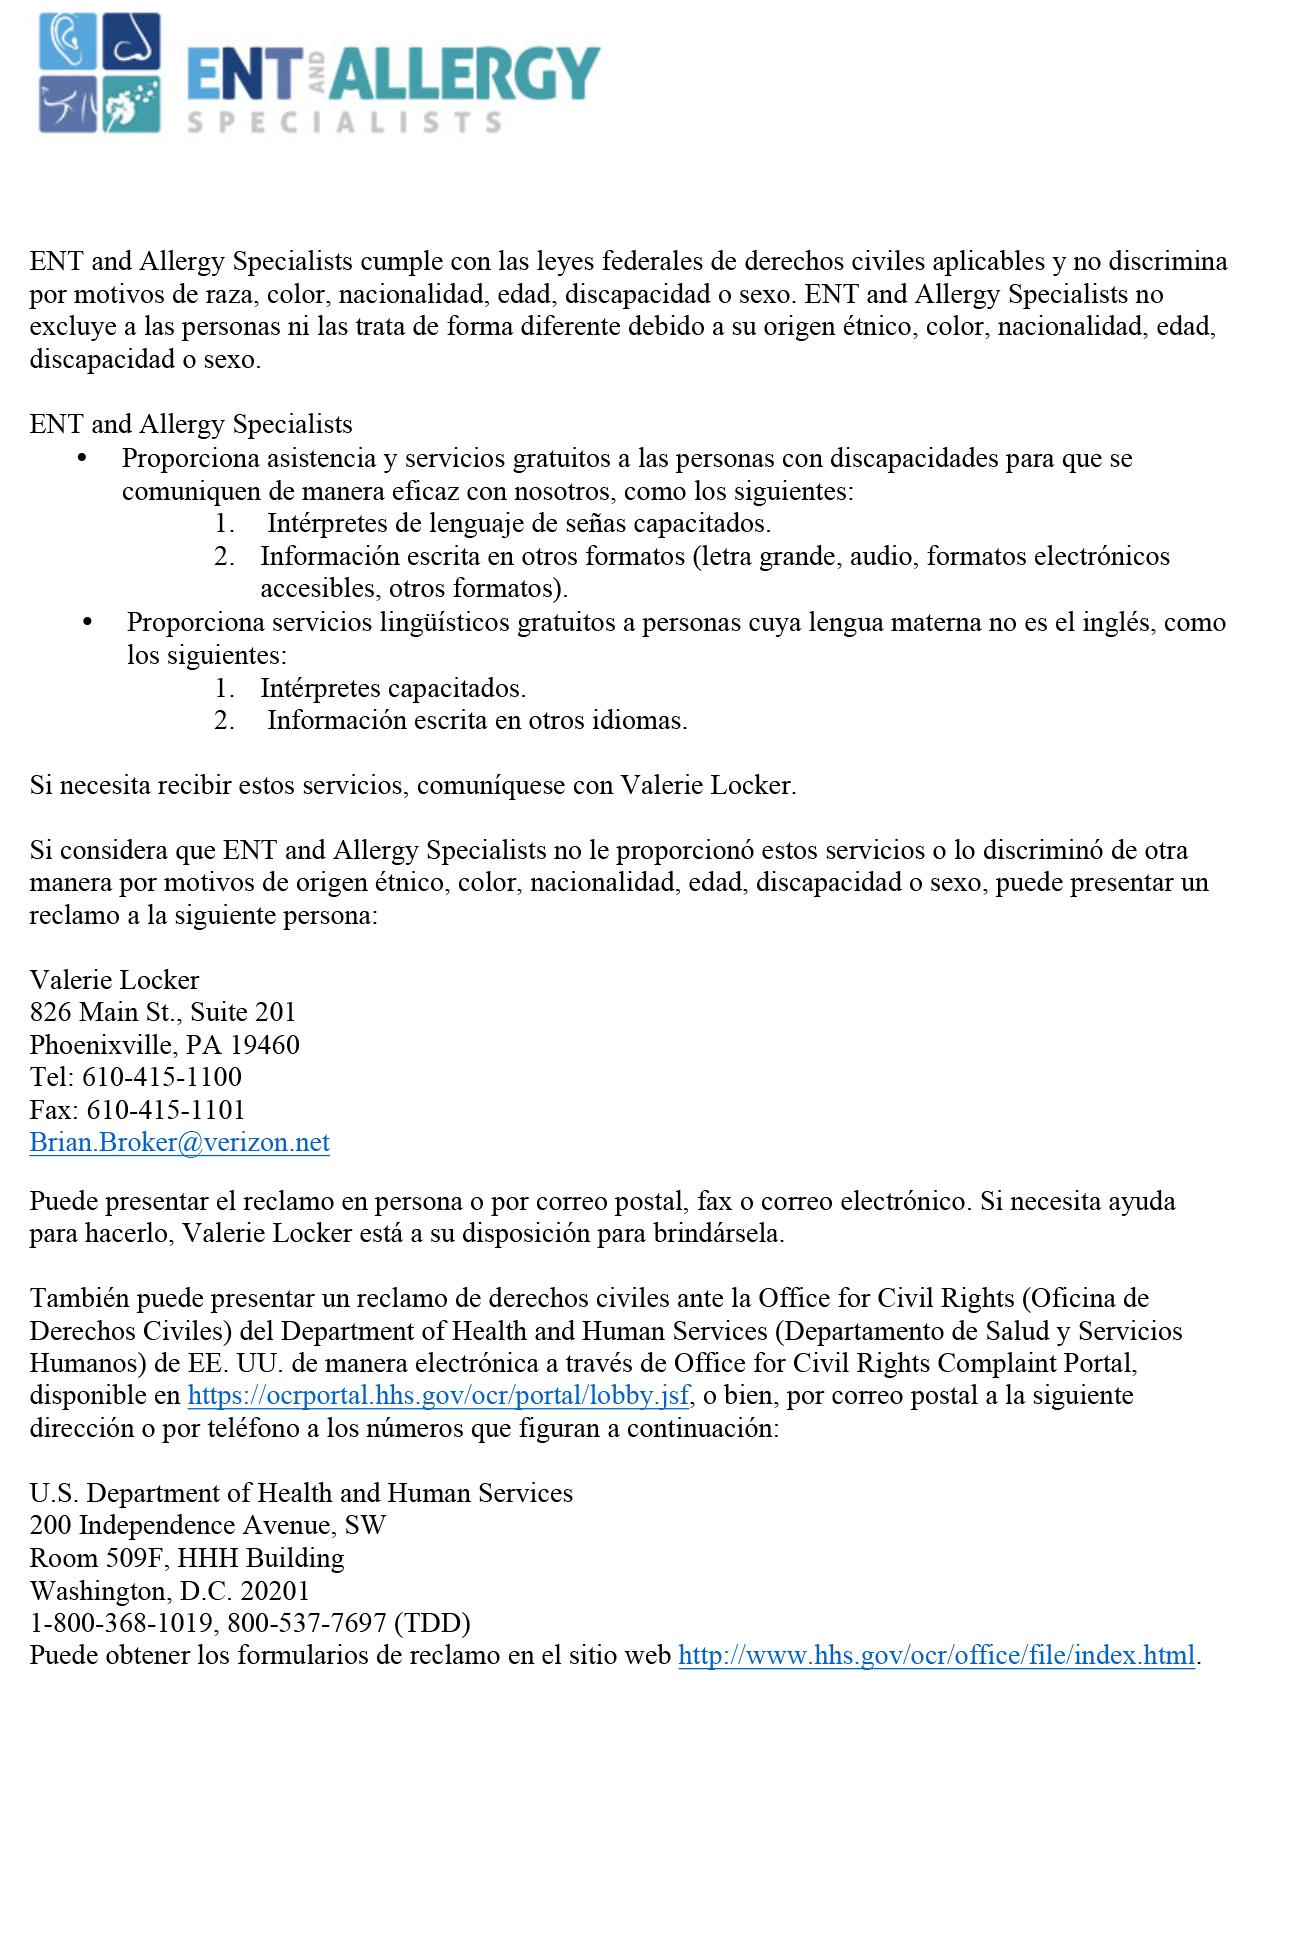 Microsoft Word - ENT Non-discrimination Espanol.docx